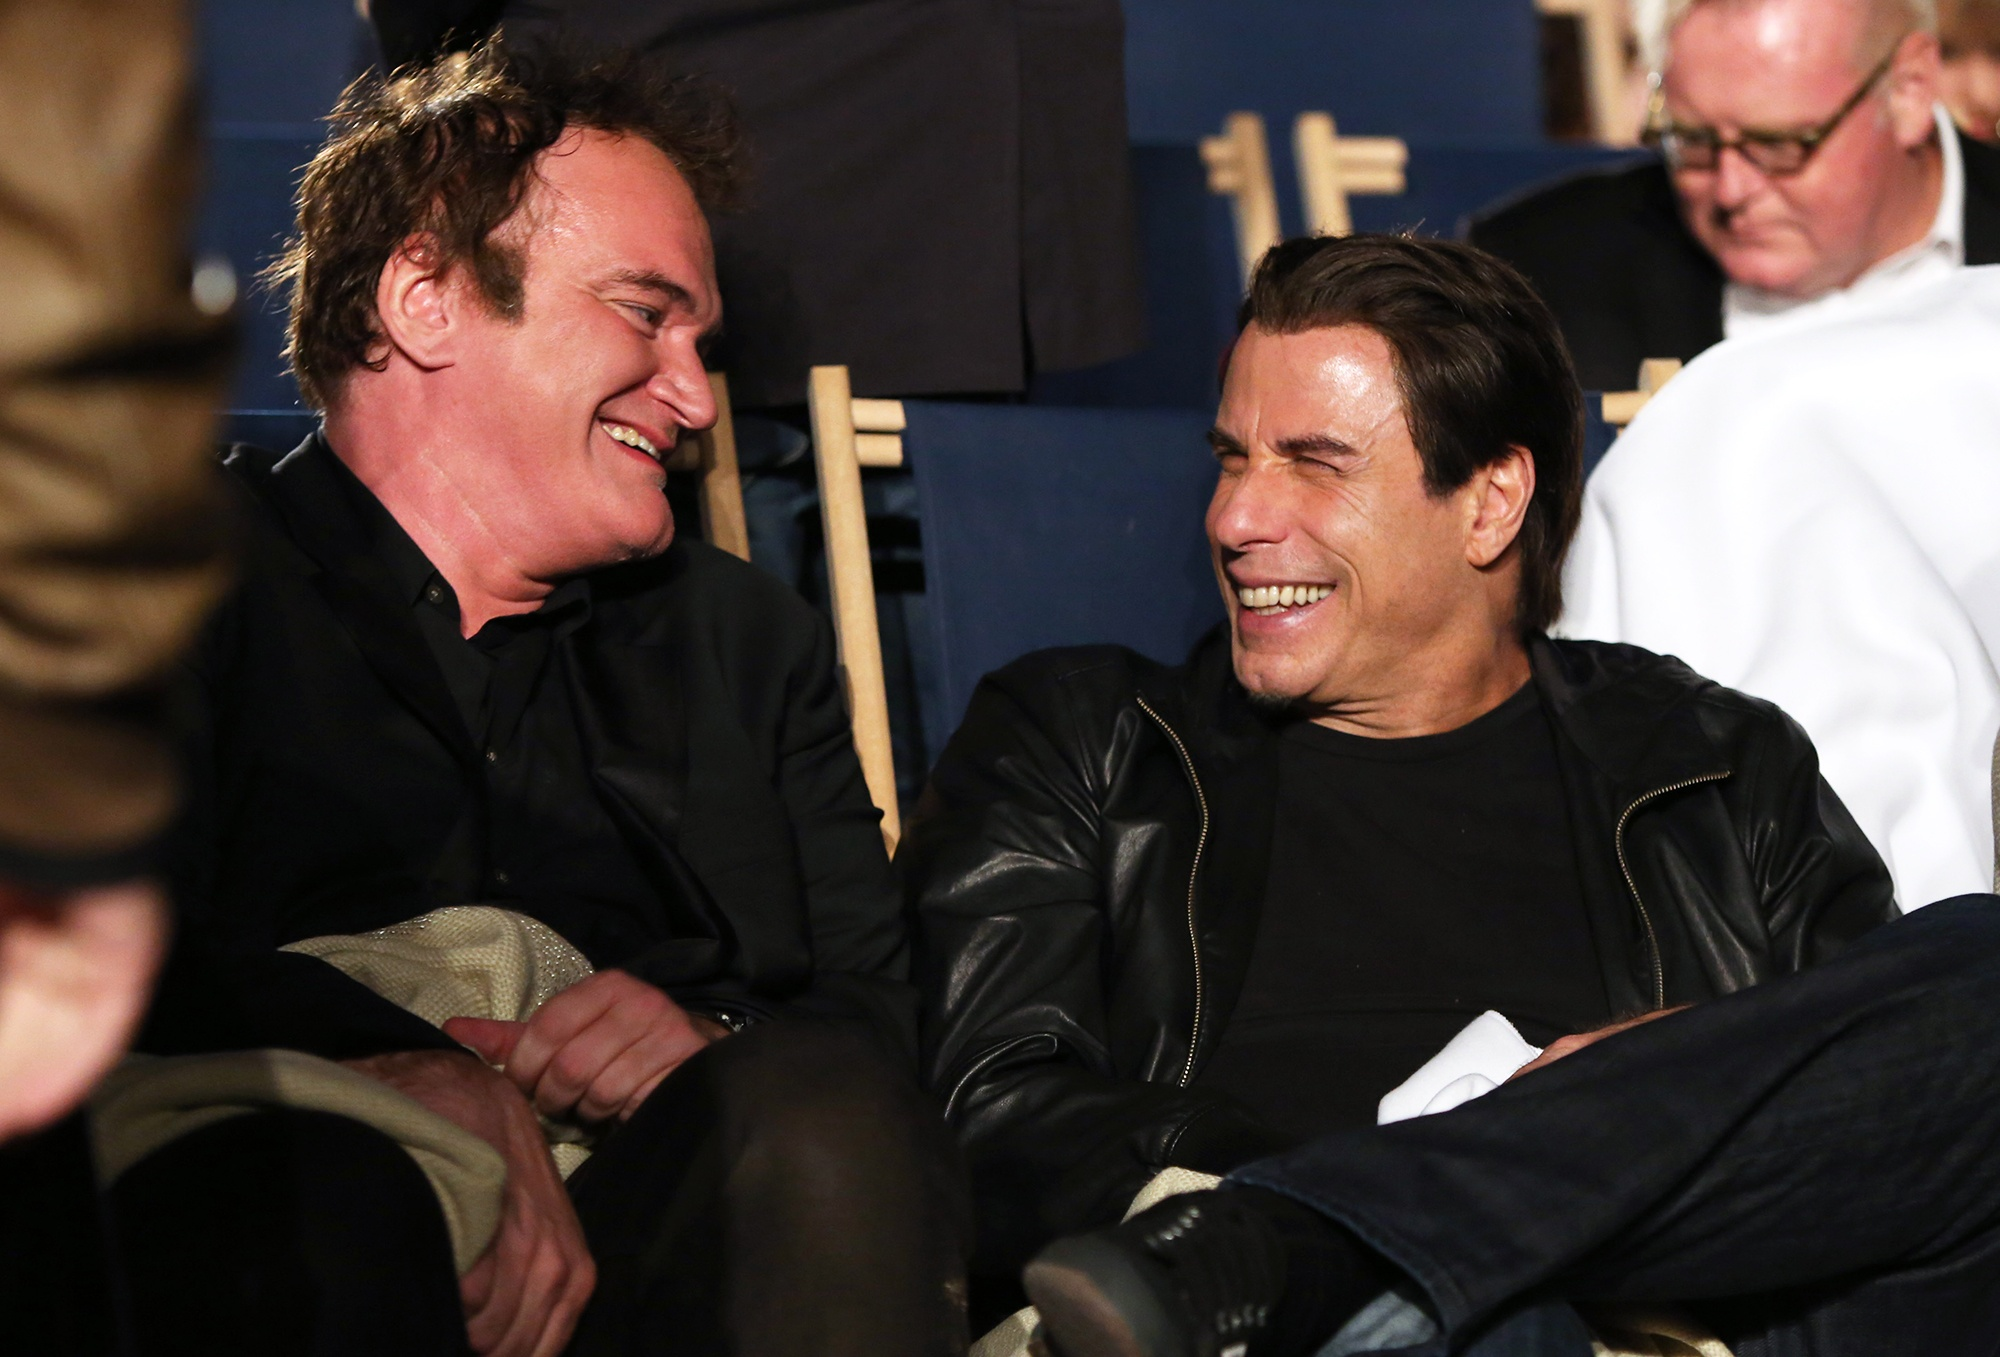 John-Travolta-Hopes-to-Appear-in-Quentin-Tarantino-10th-Film-01